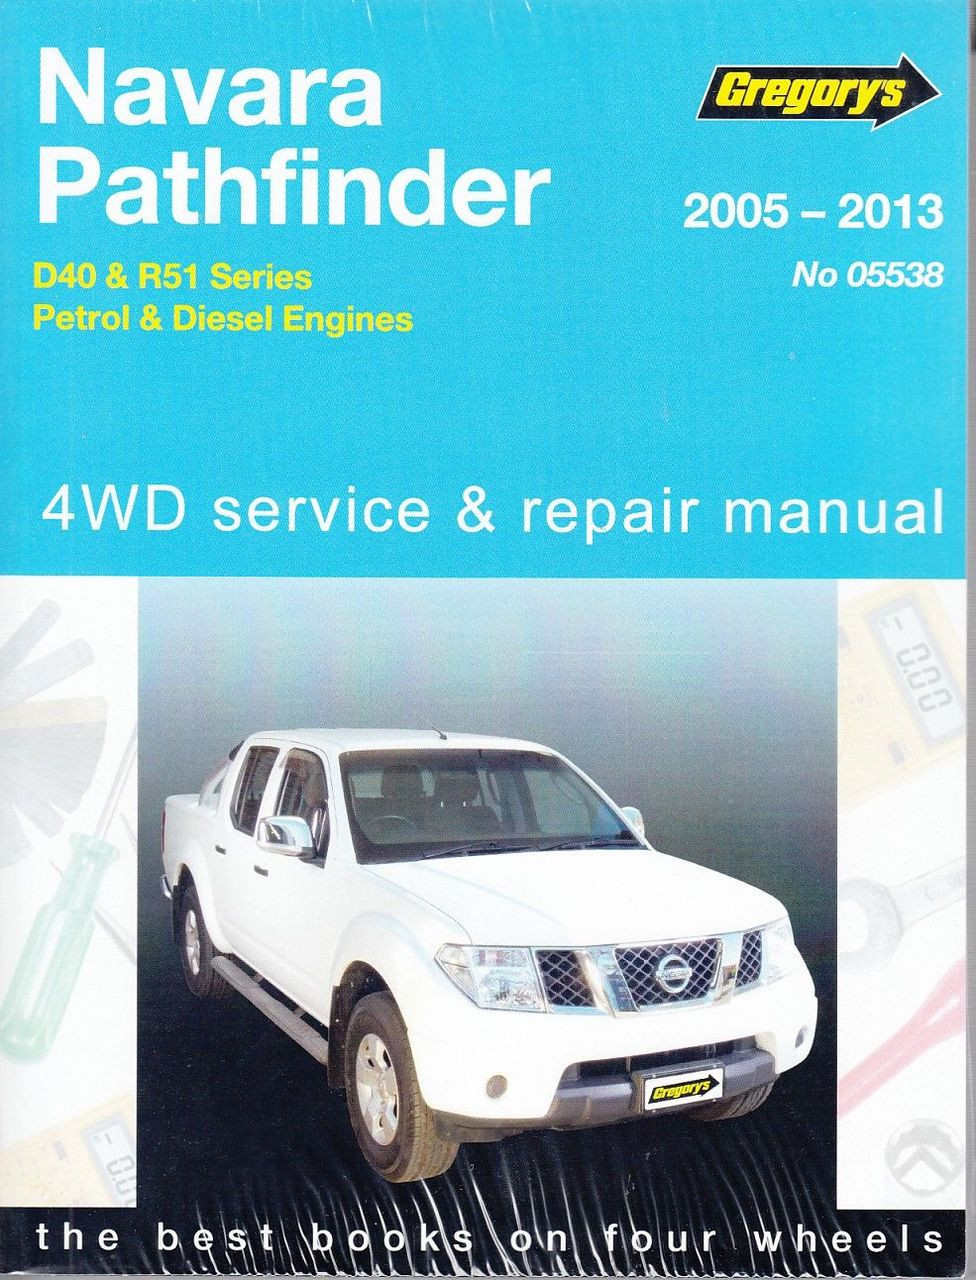 nissan navara pathfinder d40 r51 petrol diesel 2005 2013 rh automotobookshop com au Repair Manual 2009 Nissan Cube Repair Manual 2009 Nissan Cube